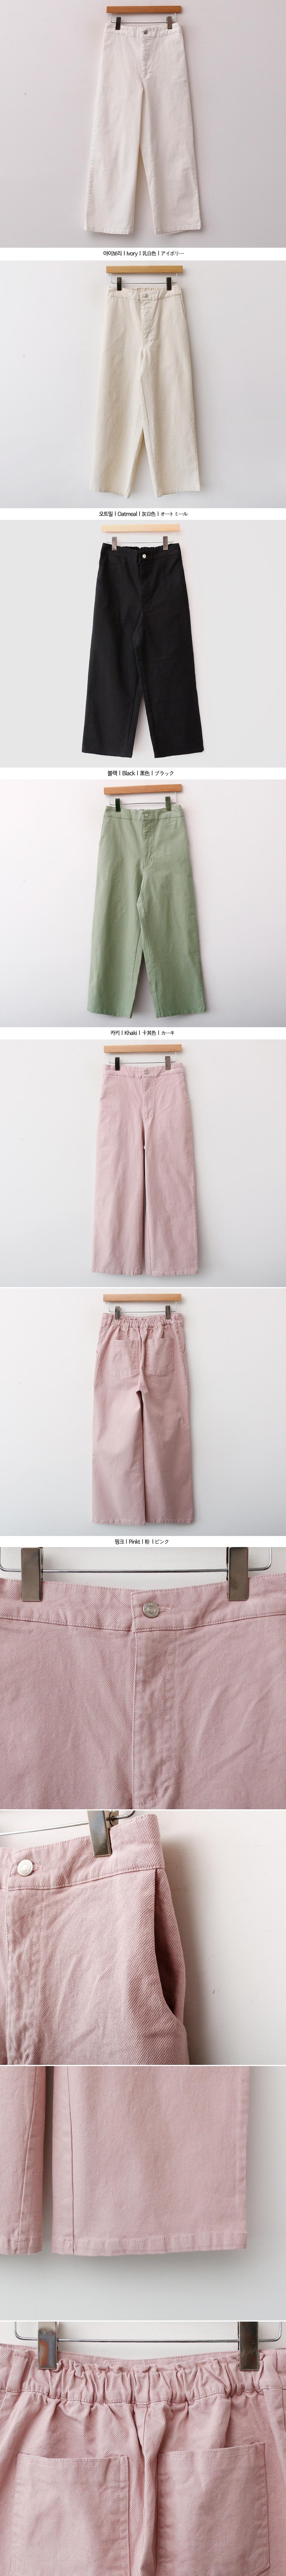 Pastel Cotton Banding Pants